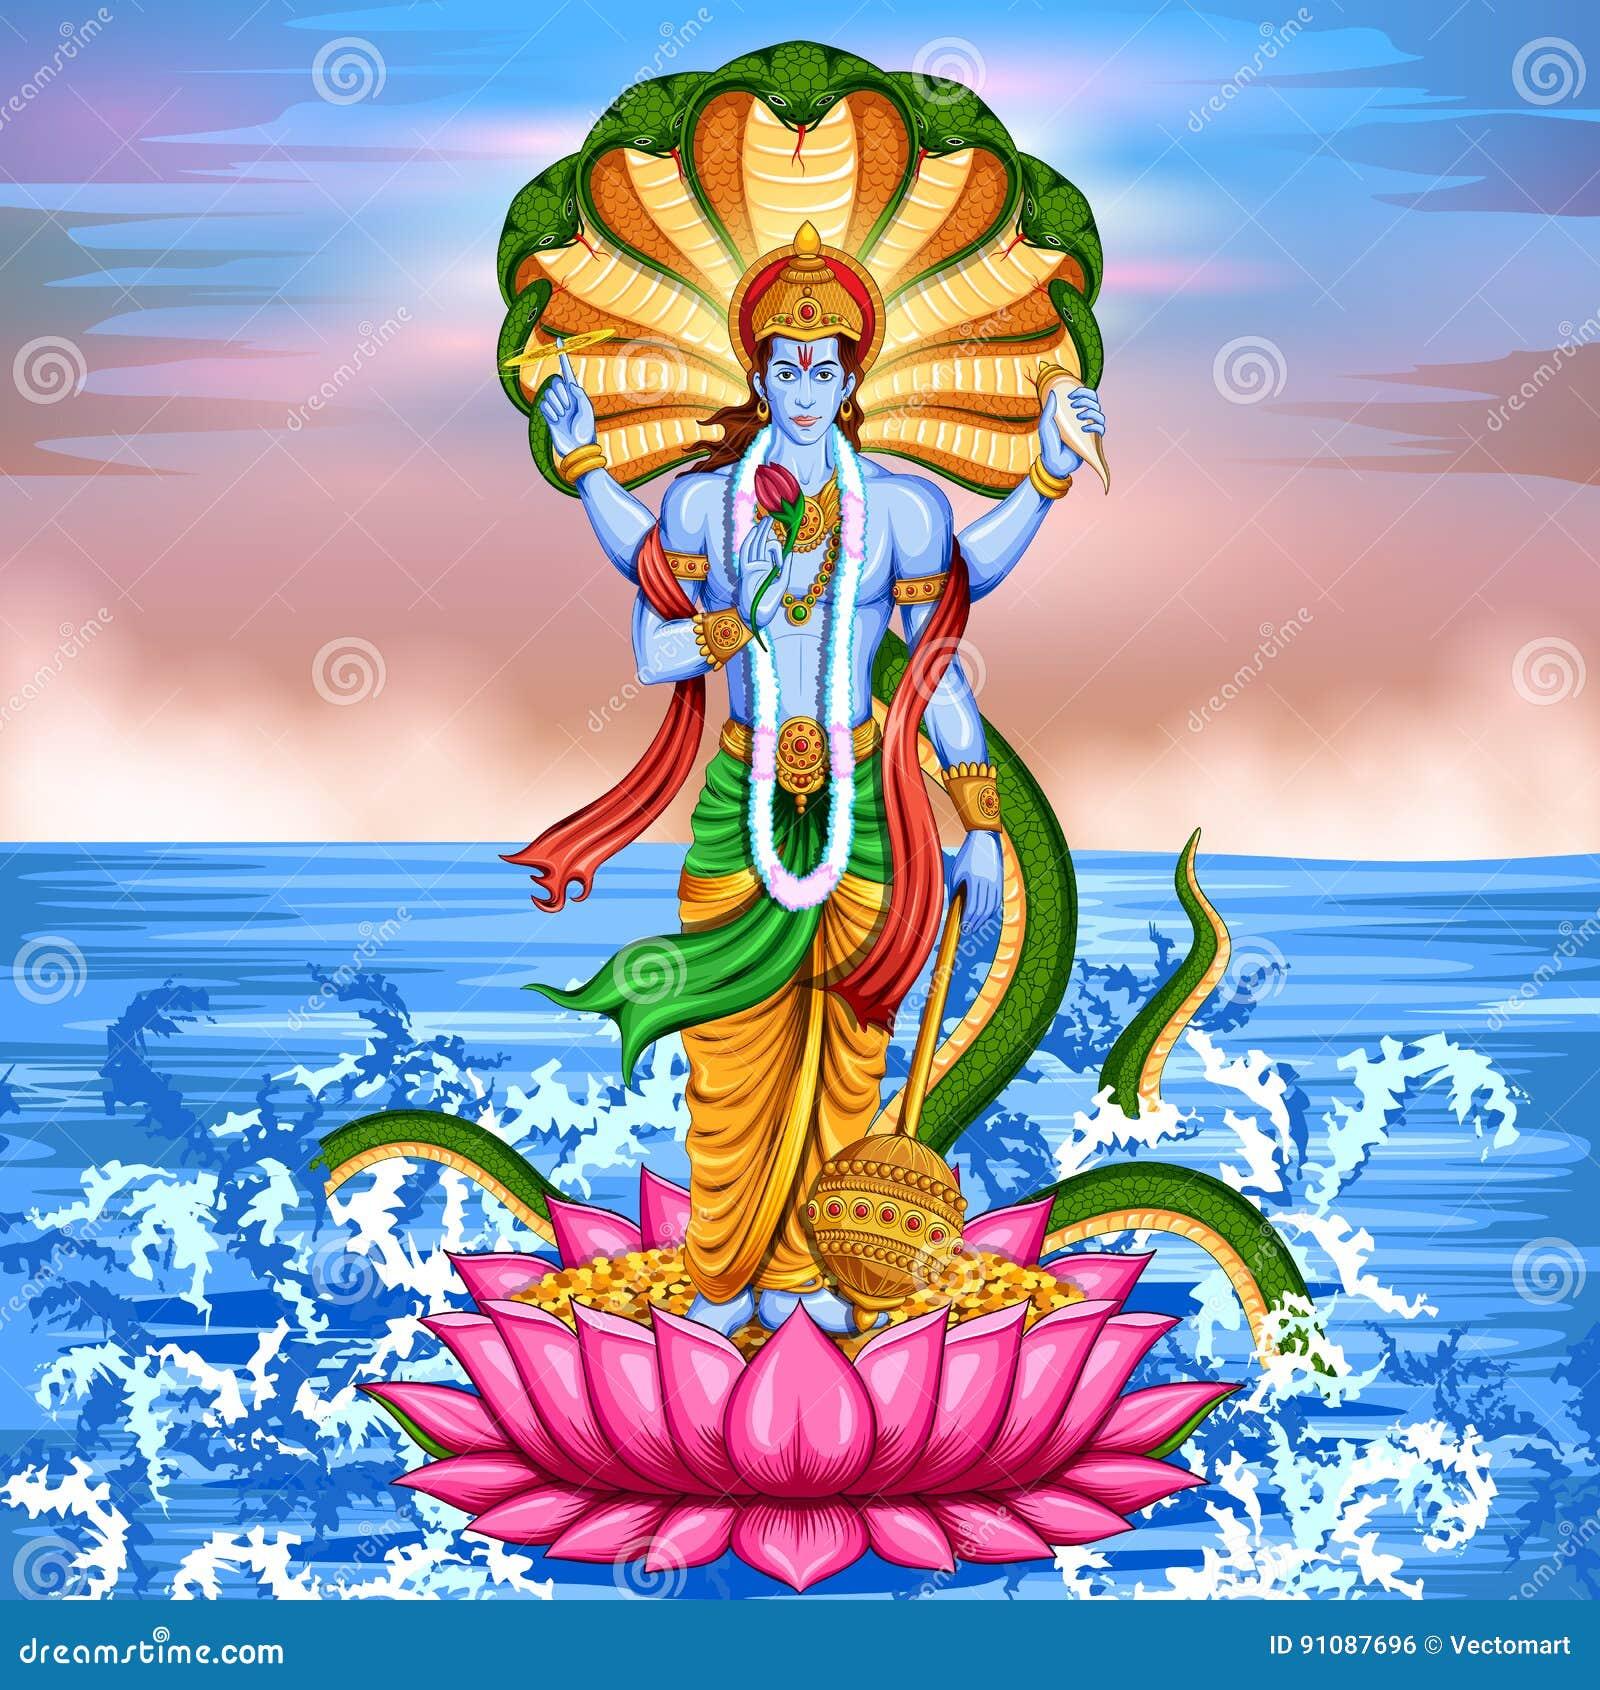 Lord Vishnu Standing On Lotus Giving Blessing Stock Vector